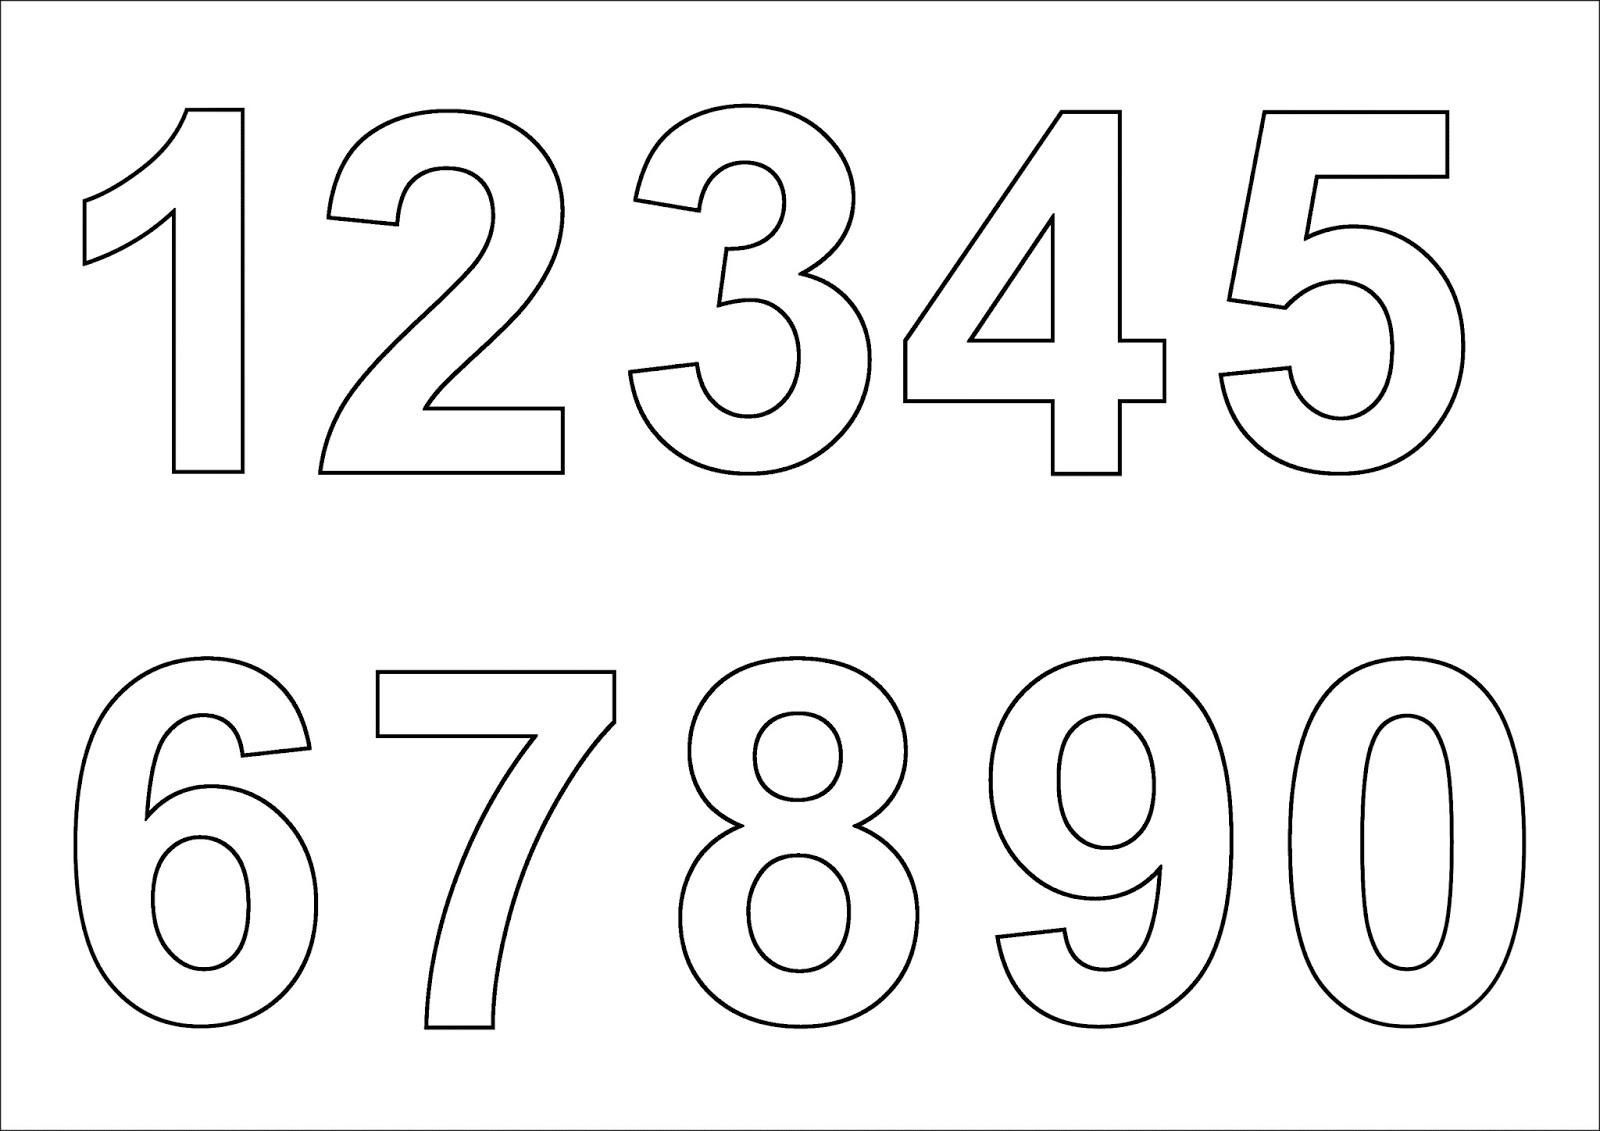 Шаблоны цифр для печати скачать